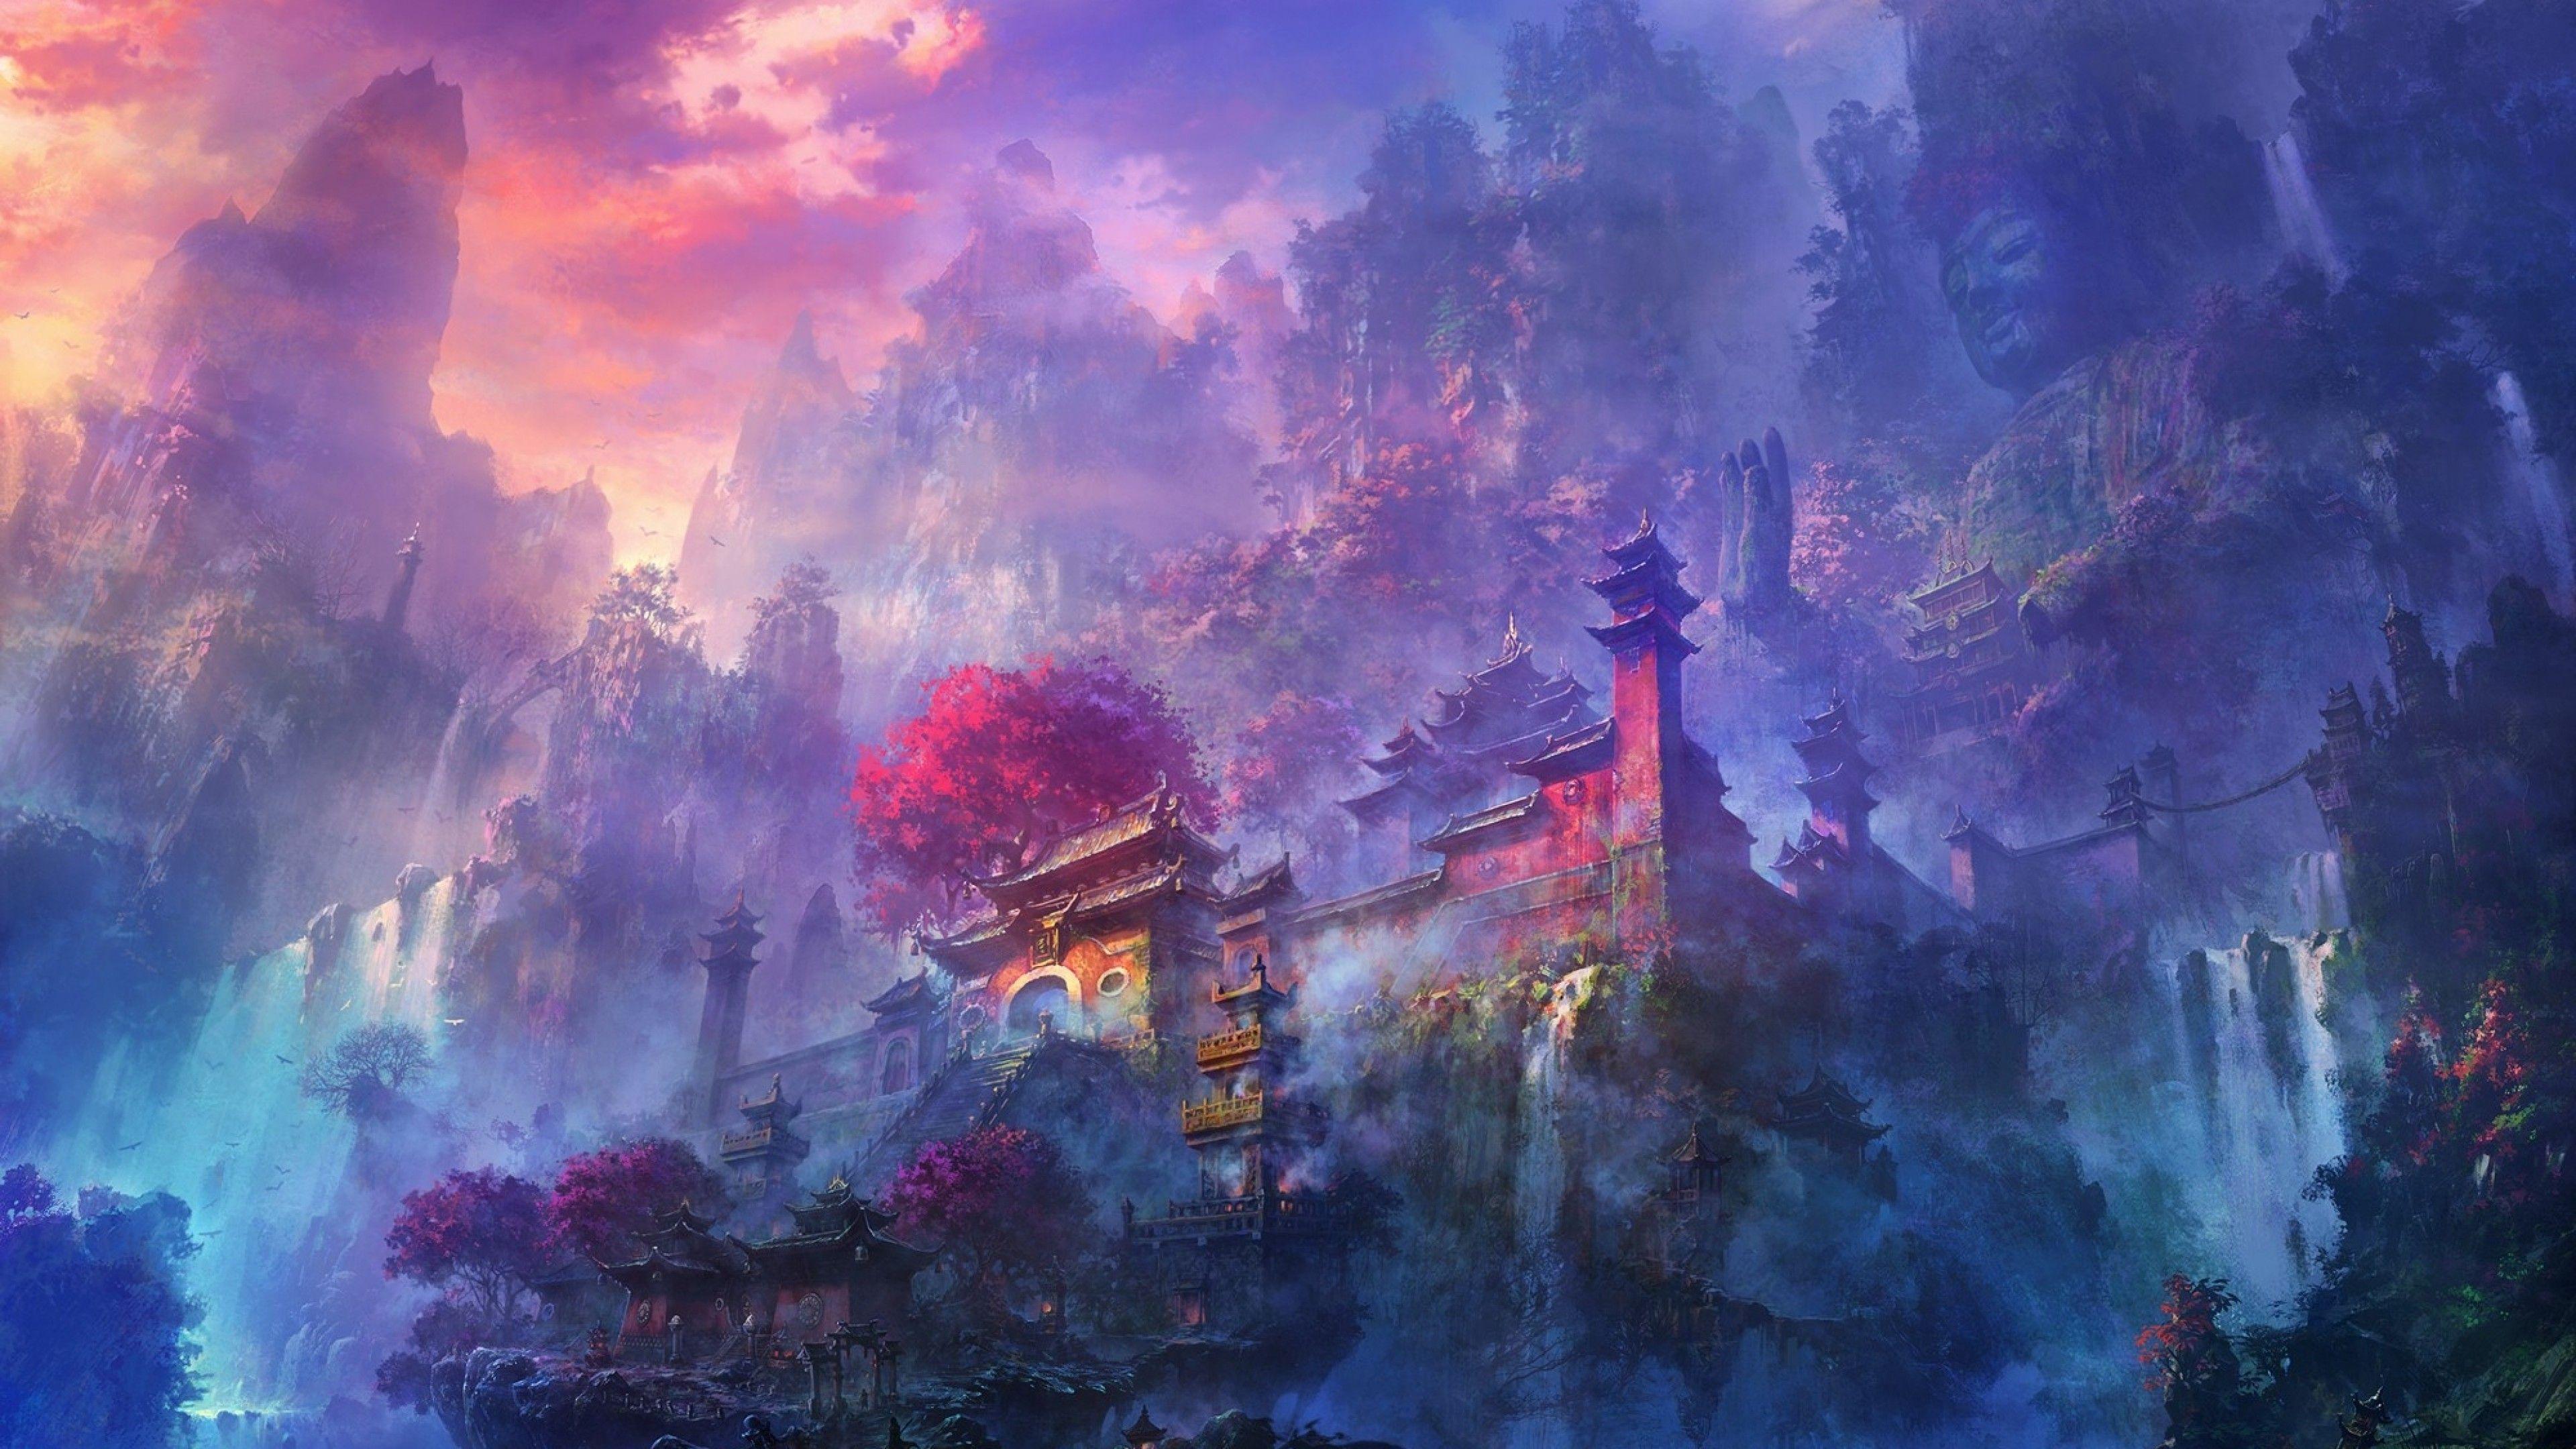 Shaolin Temple By Shuxing Li 3840 X 2160 Anime Scenery Wallpaper Anime Scenery Anime Wallpaper 1920x1080